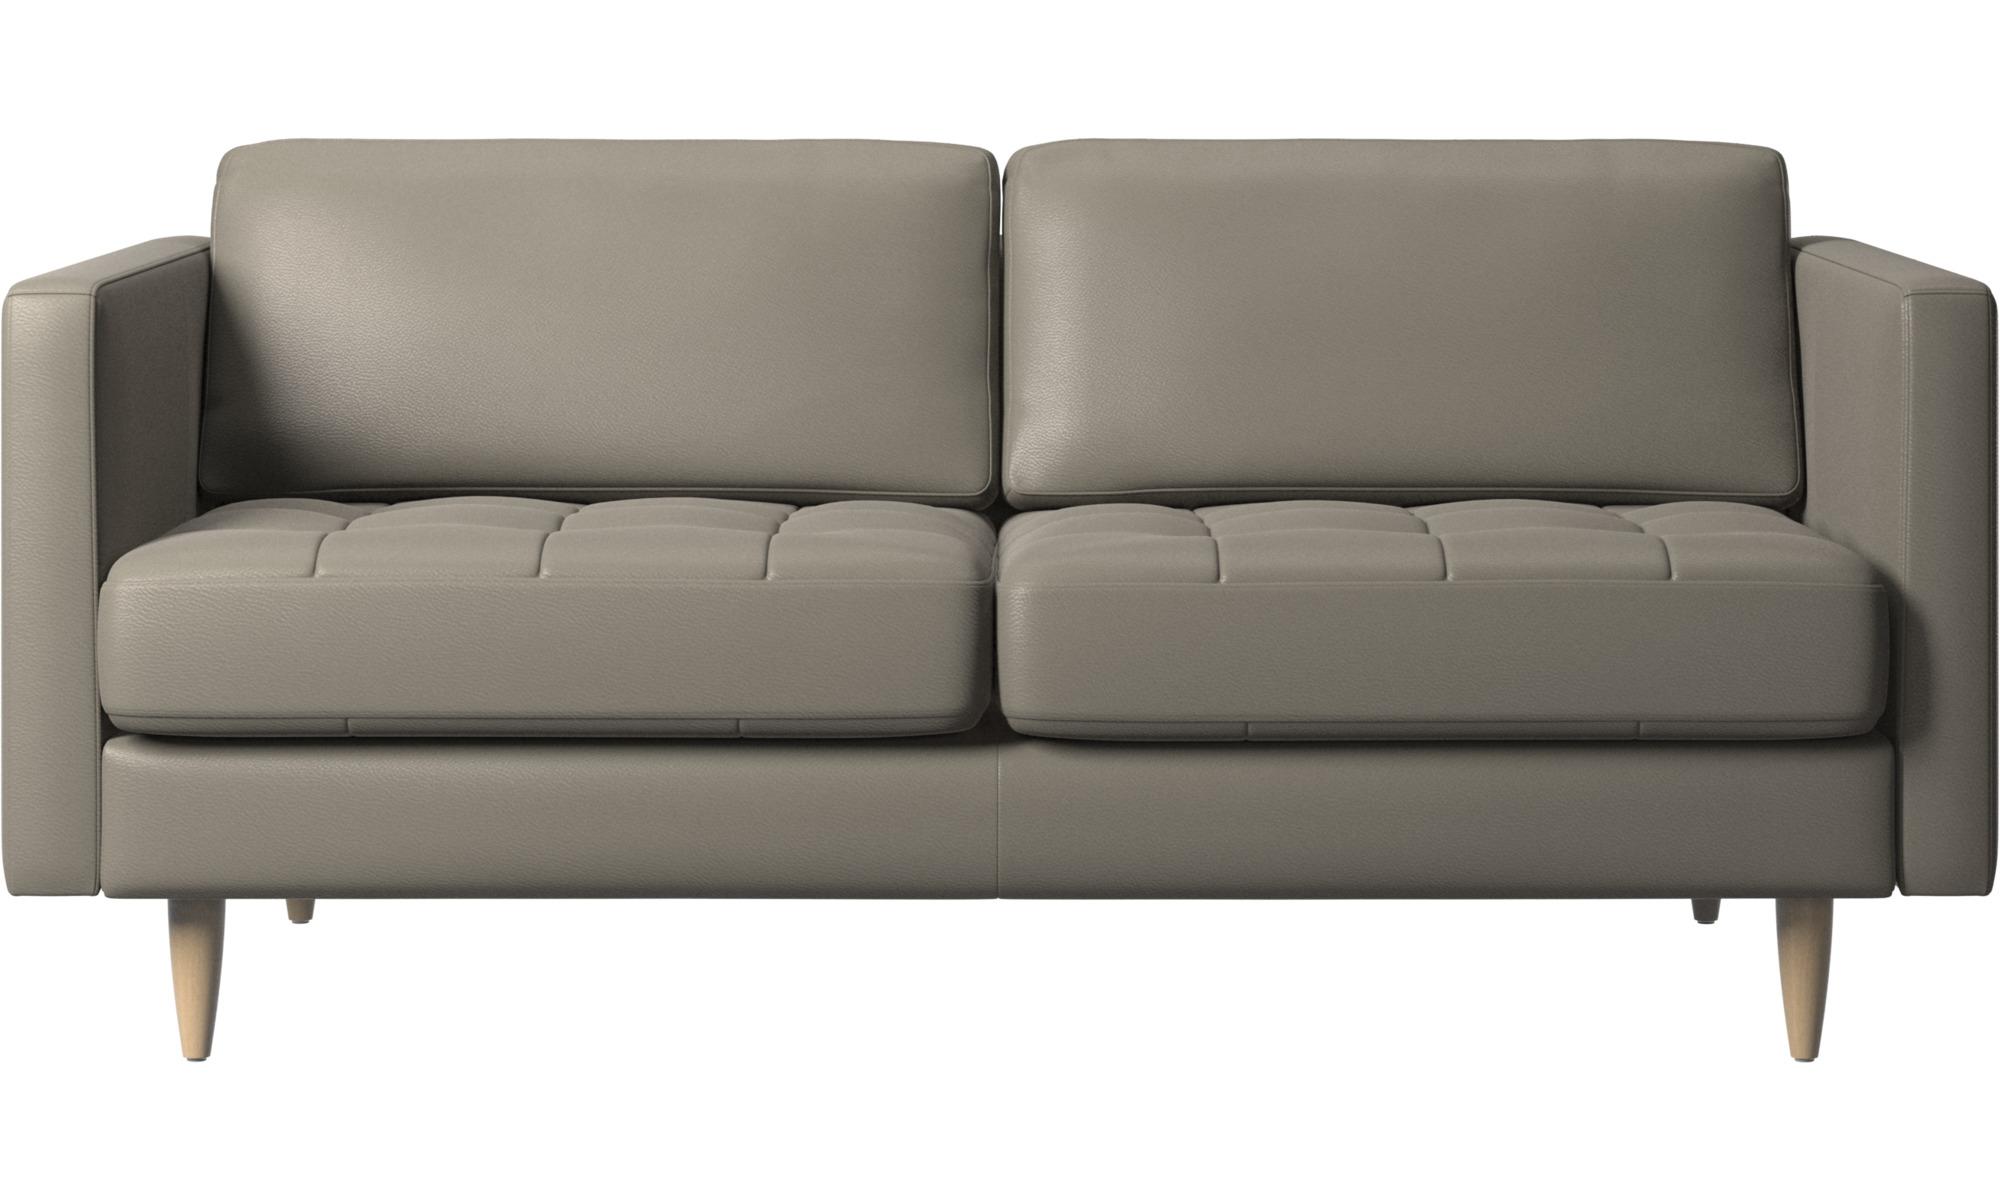 2 personers sofaer - Osaka sofa, tuftet sædehynde - Grå - Læder